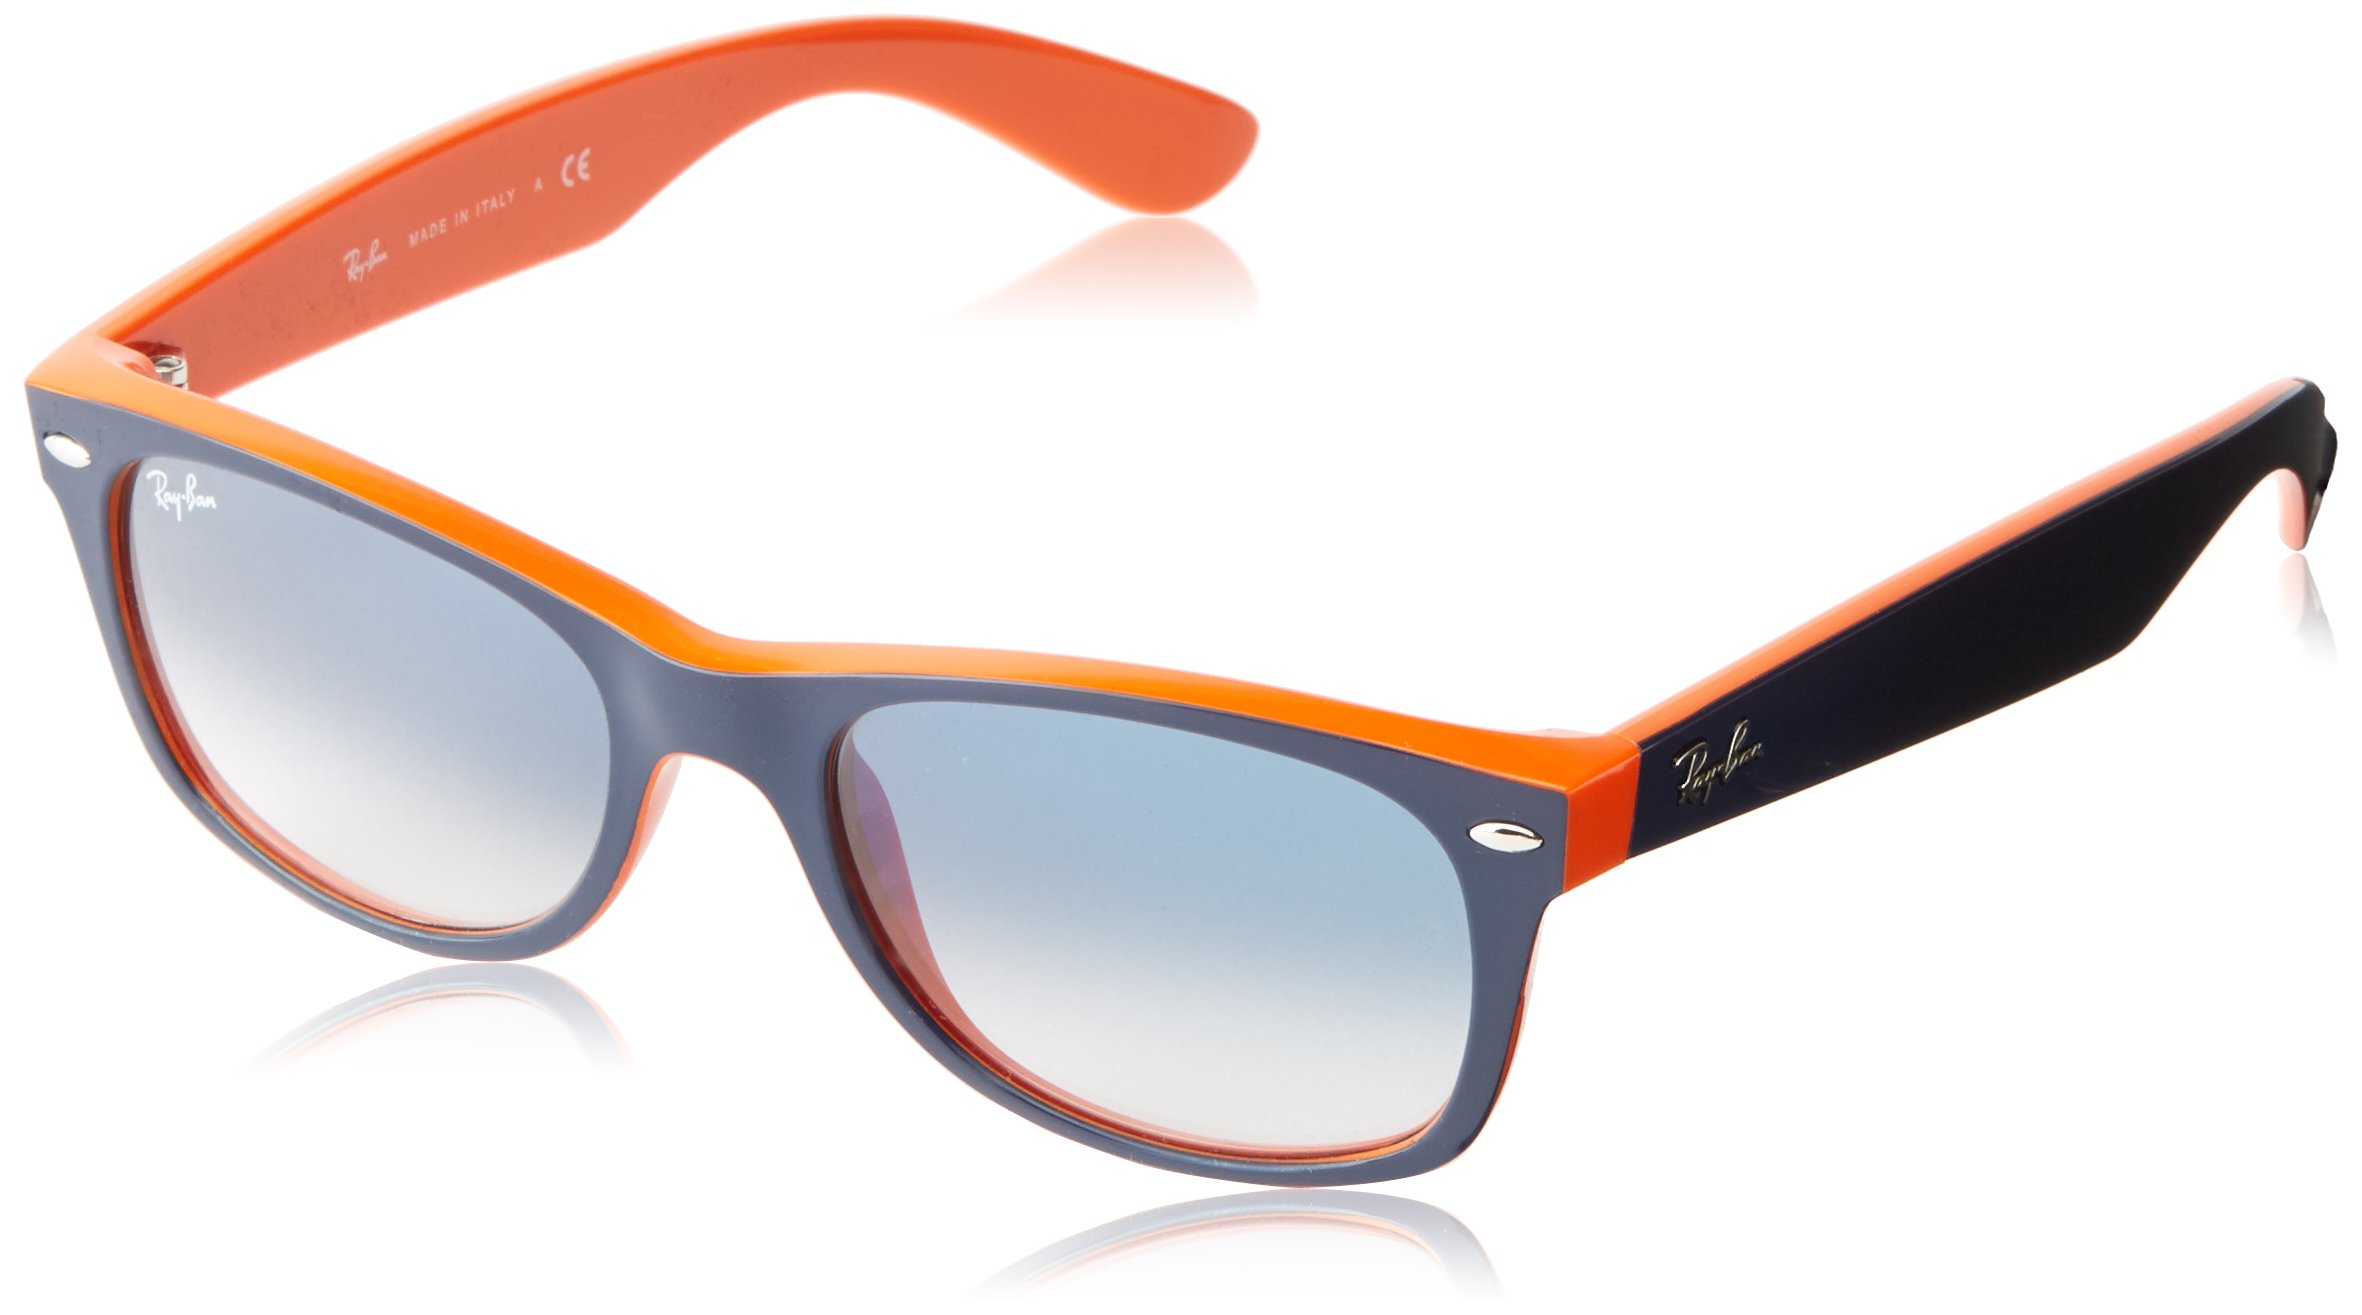 RAY-BAN RB2132 New Wayfarer Sunglasses, Blue & Orange/Blue Gradient, 52 mm by RAY-BAN